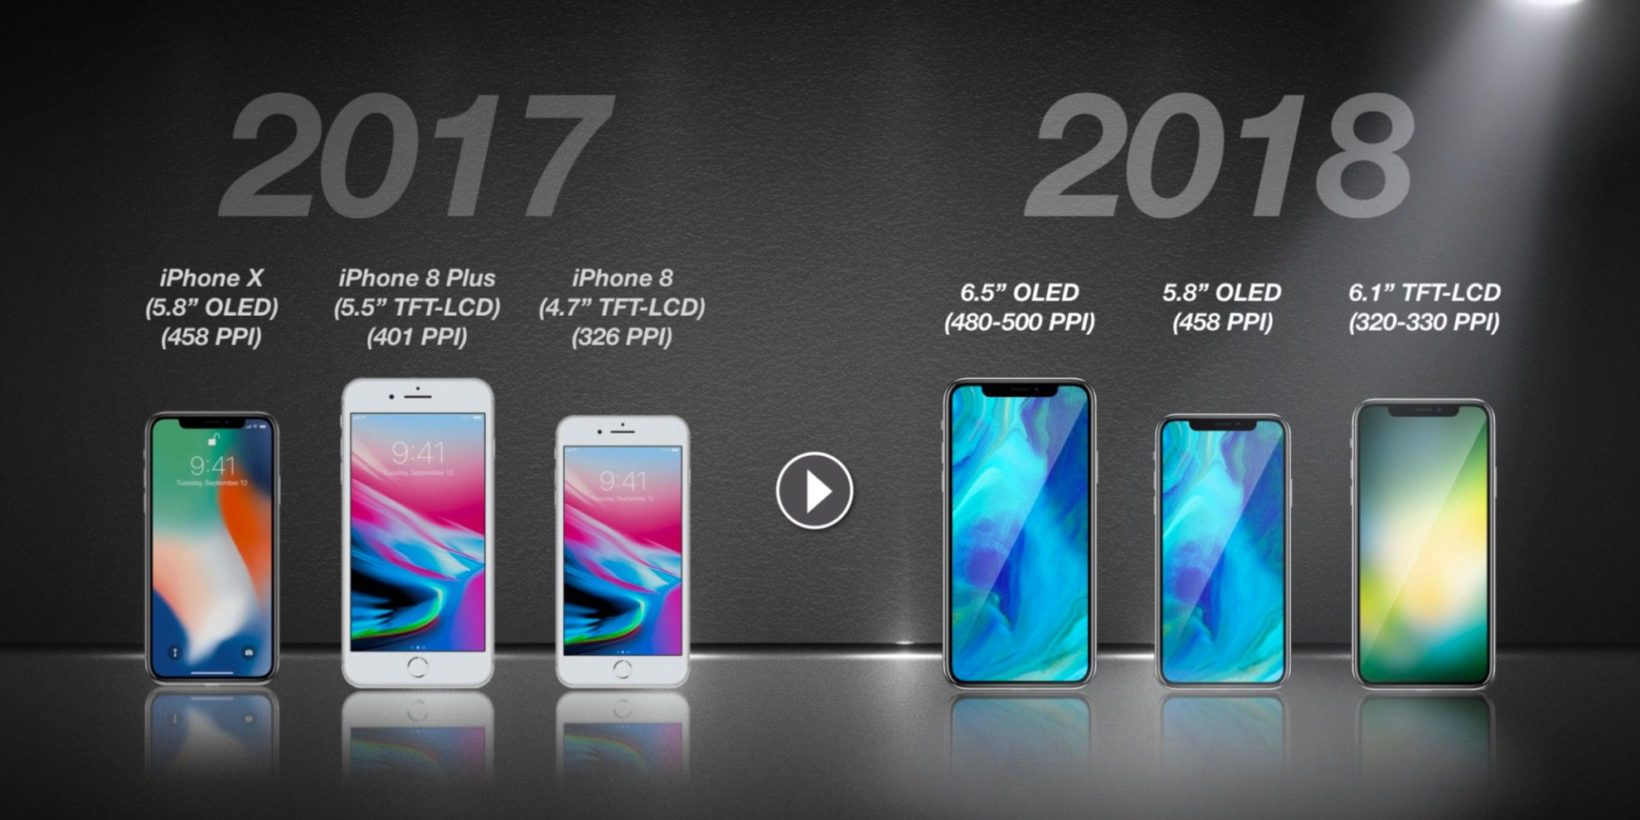 iphone 2018 oled - foto gamma iPhone 2017 e 2018 iphone x plus